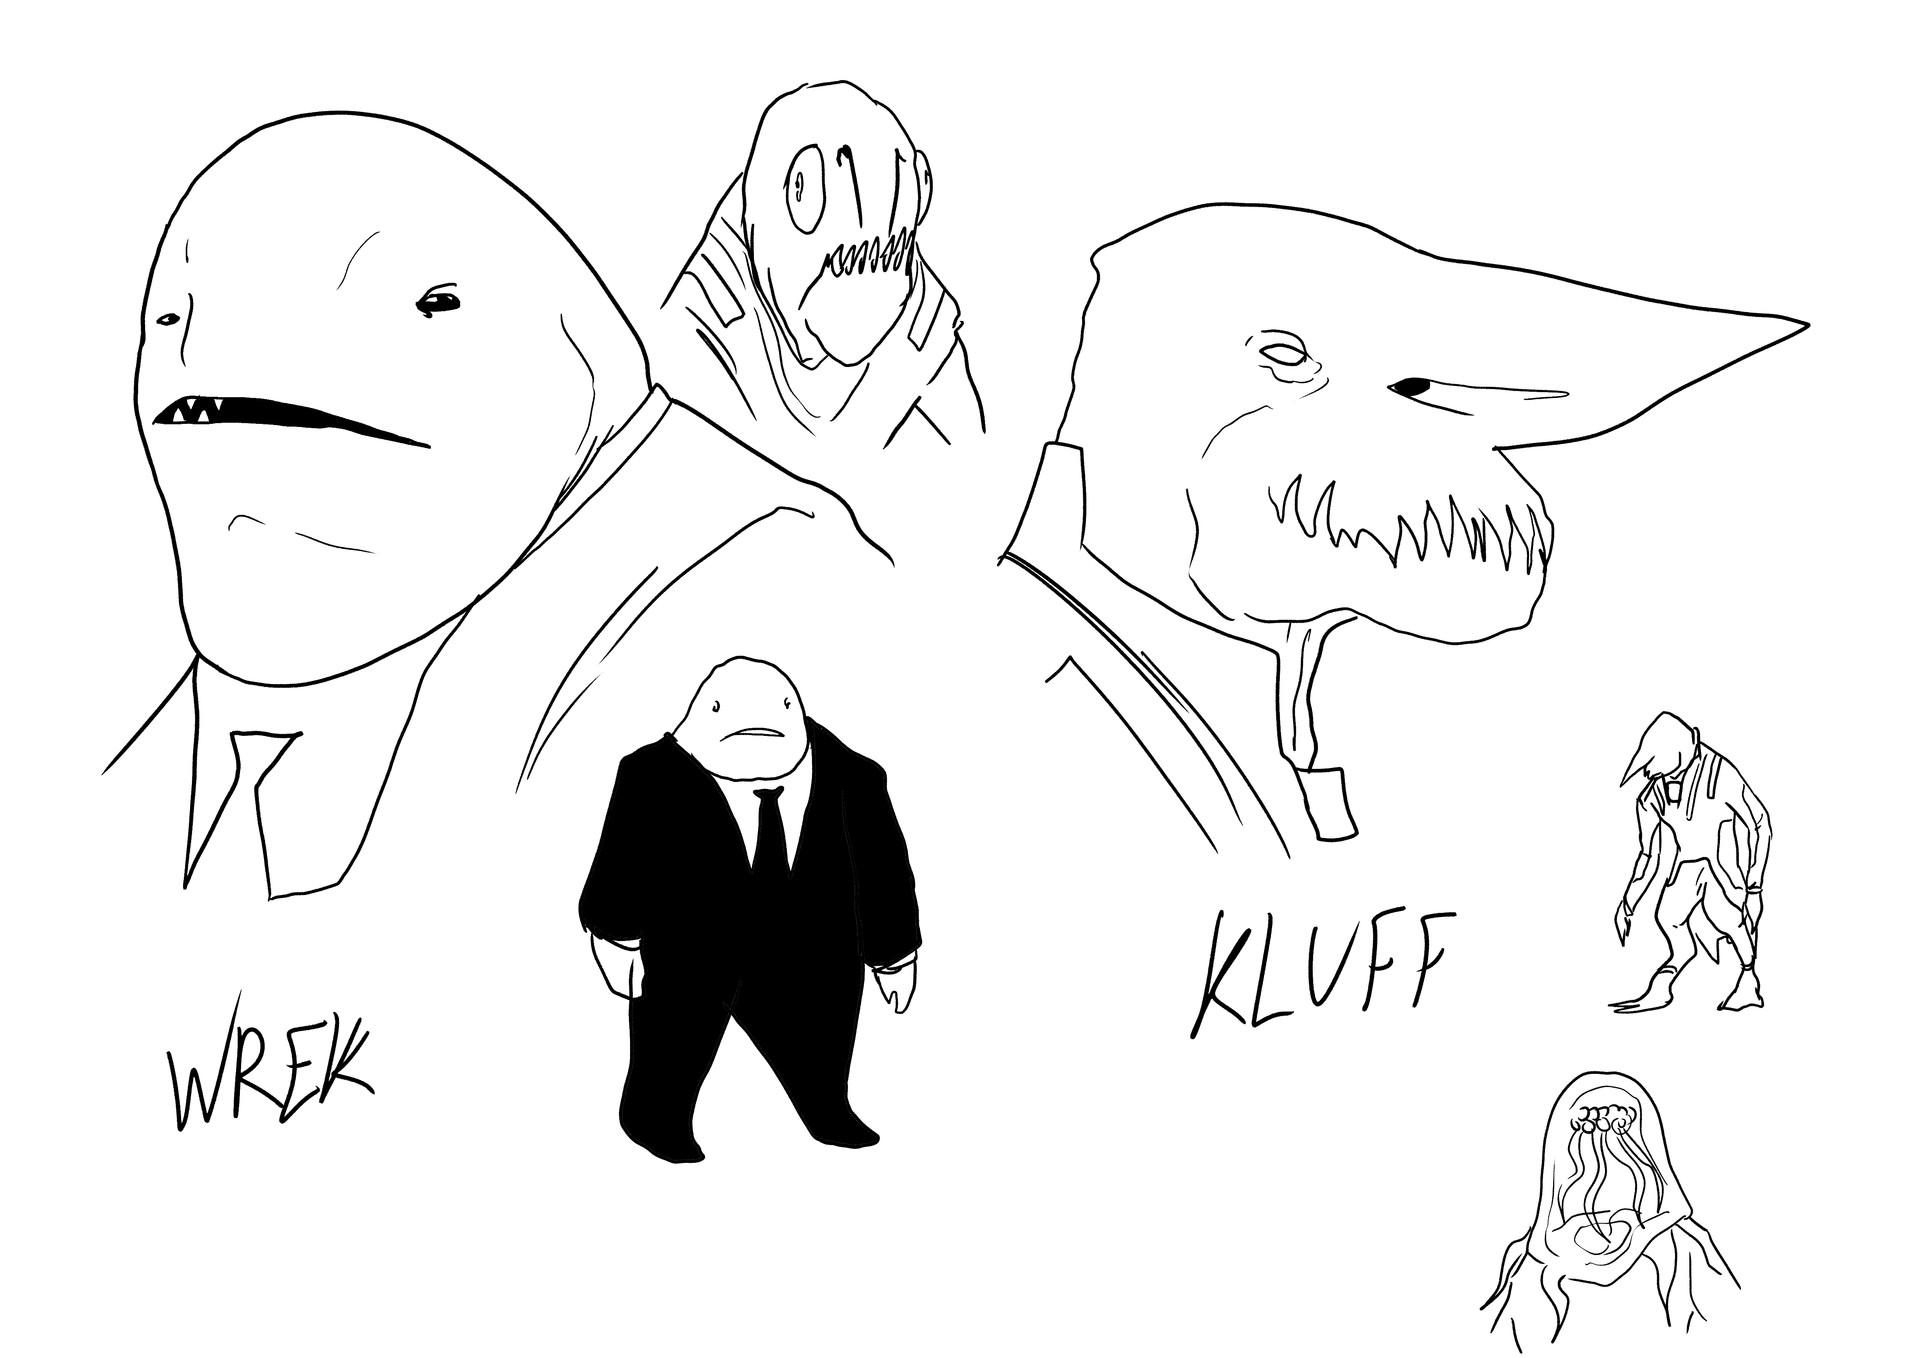 Character Designs - Aliens